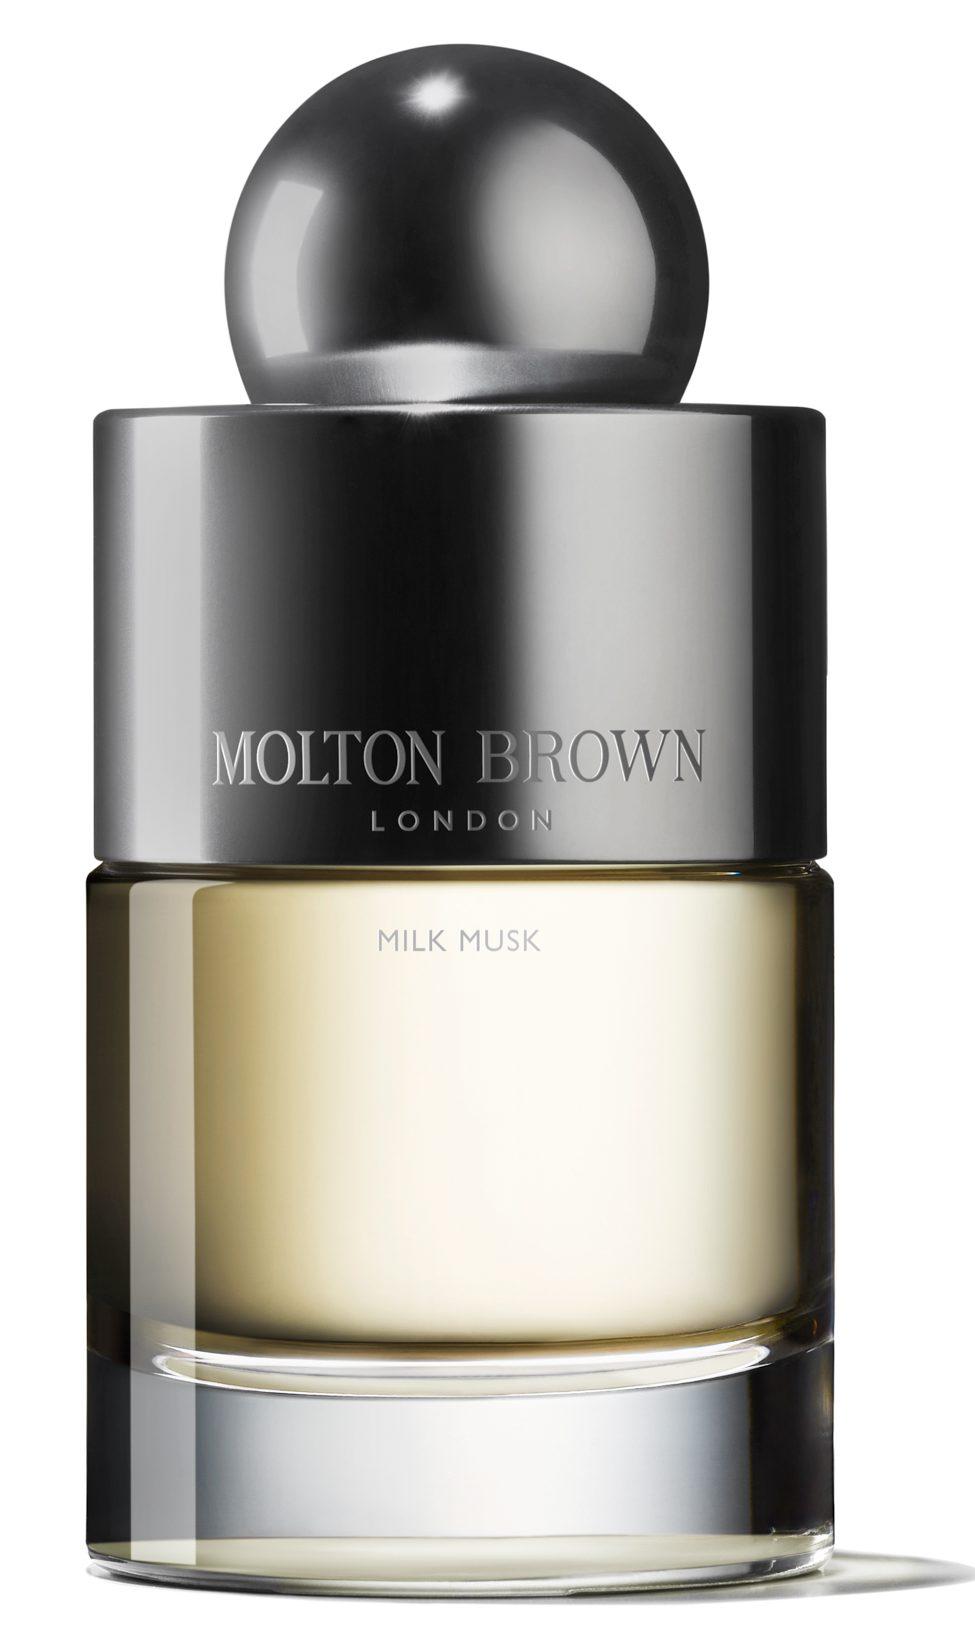 MOLTON_BROWN_MILK_MUSK_EDT.